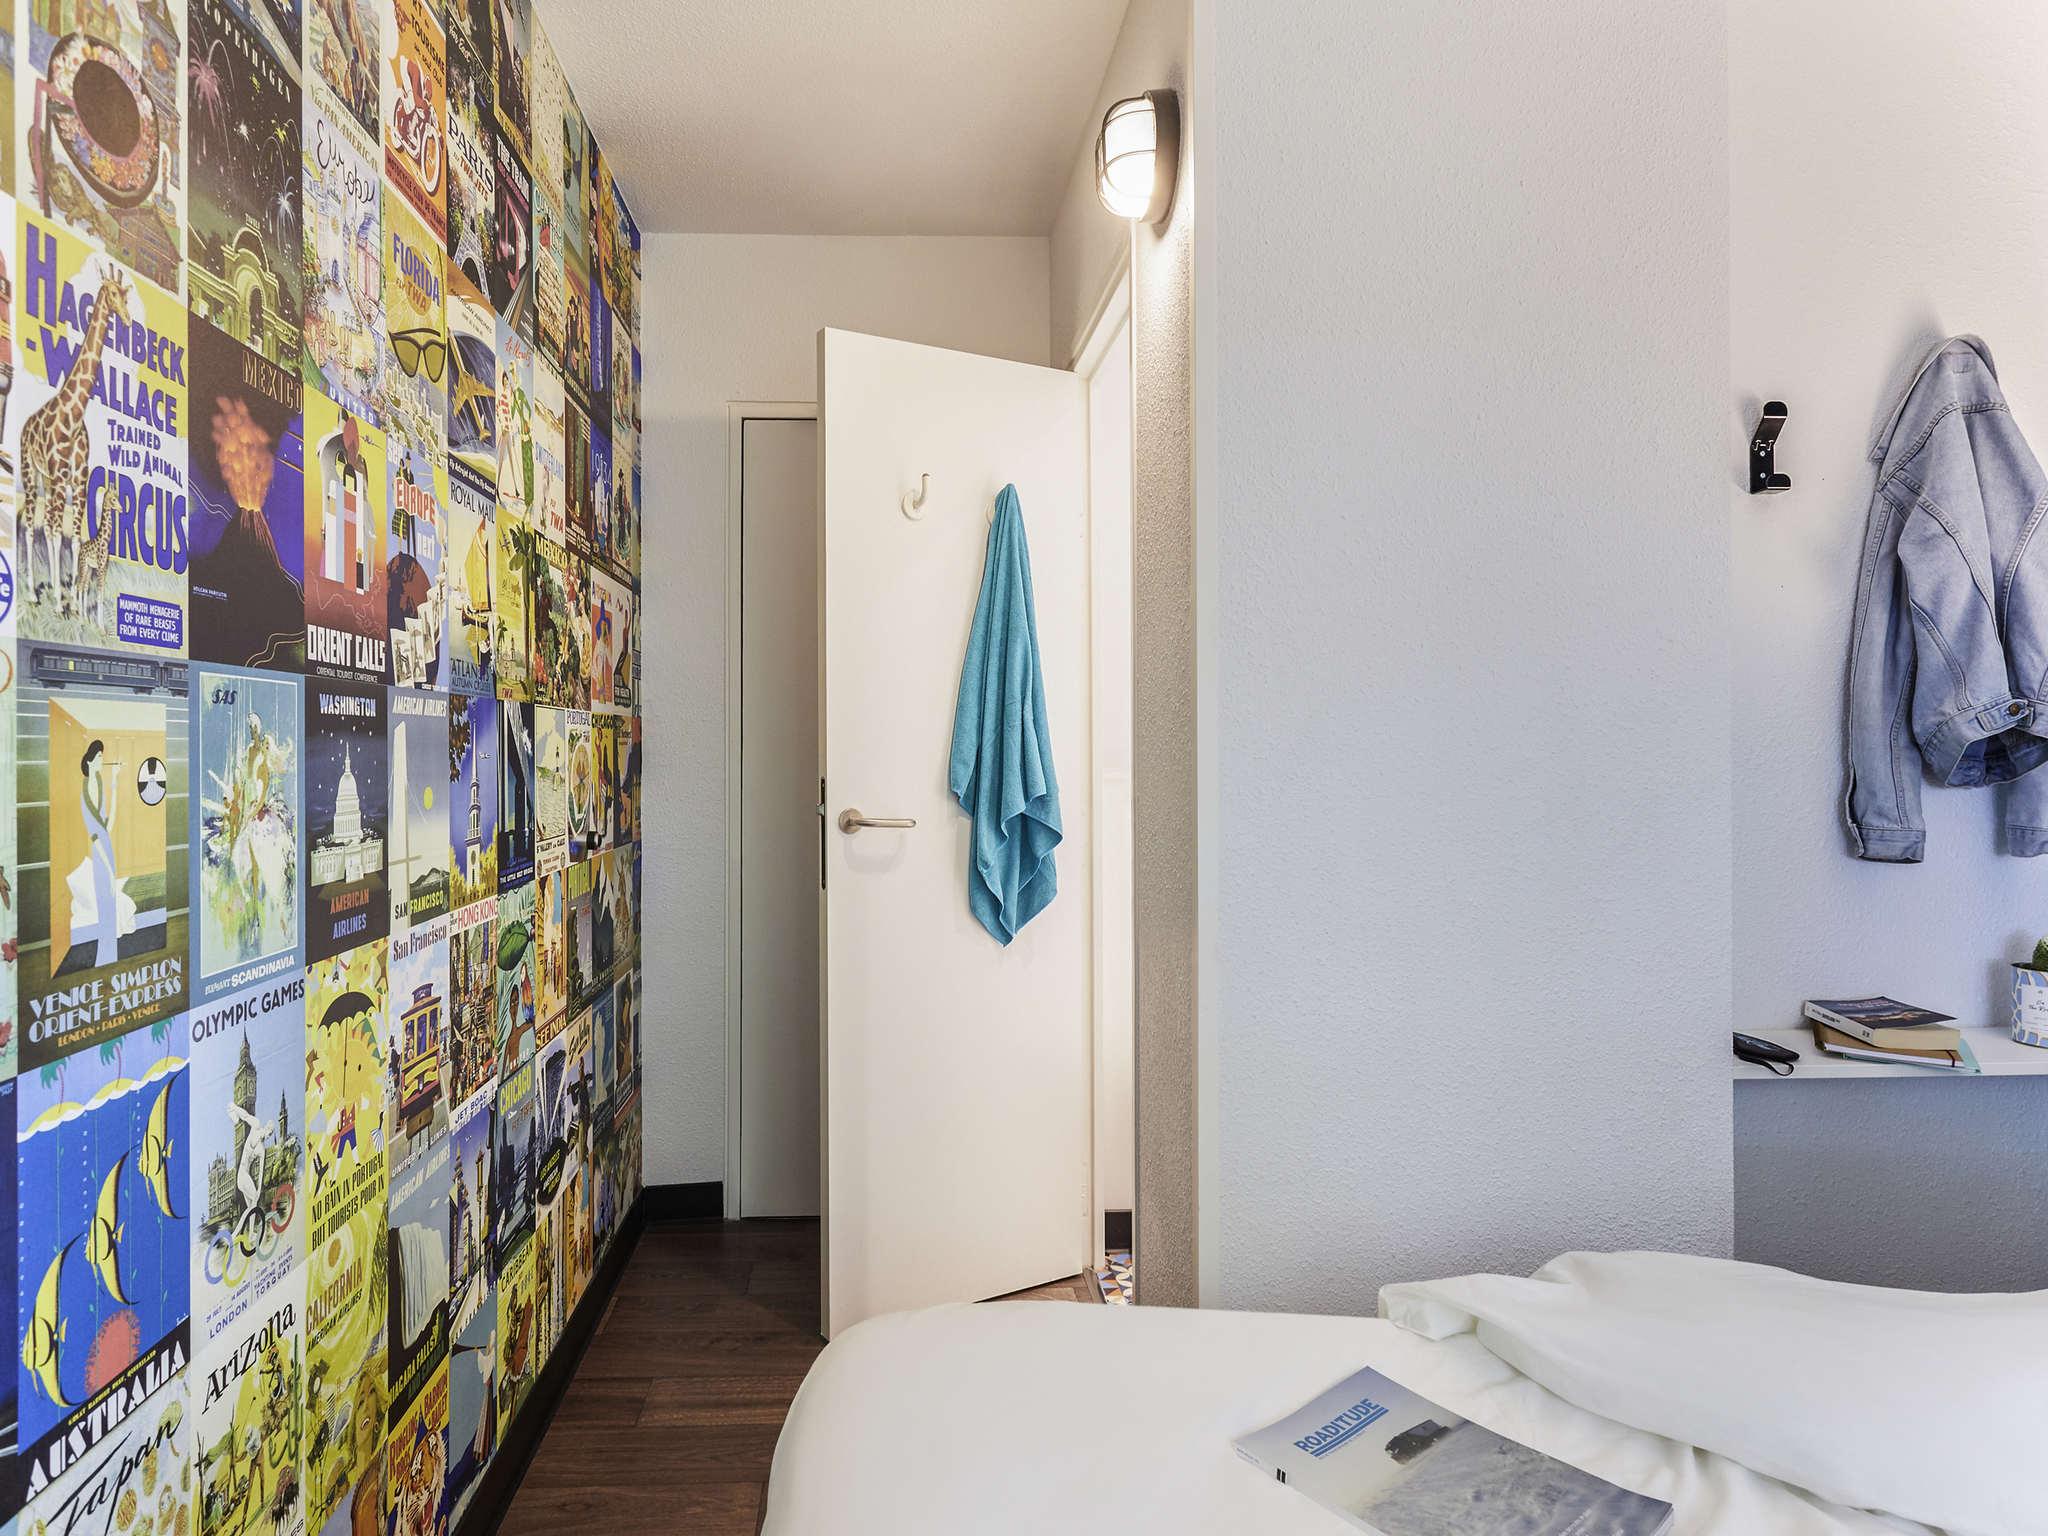 Hotel - hotelF1 Mulhouse Bâle Airport